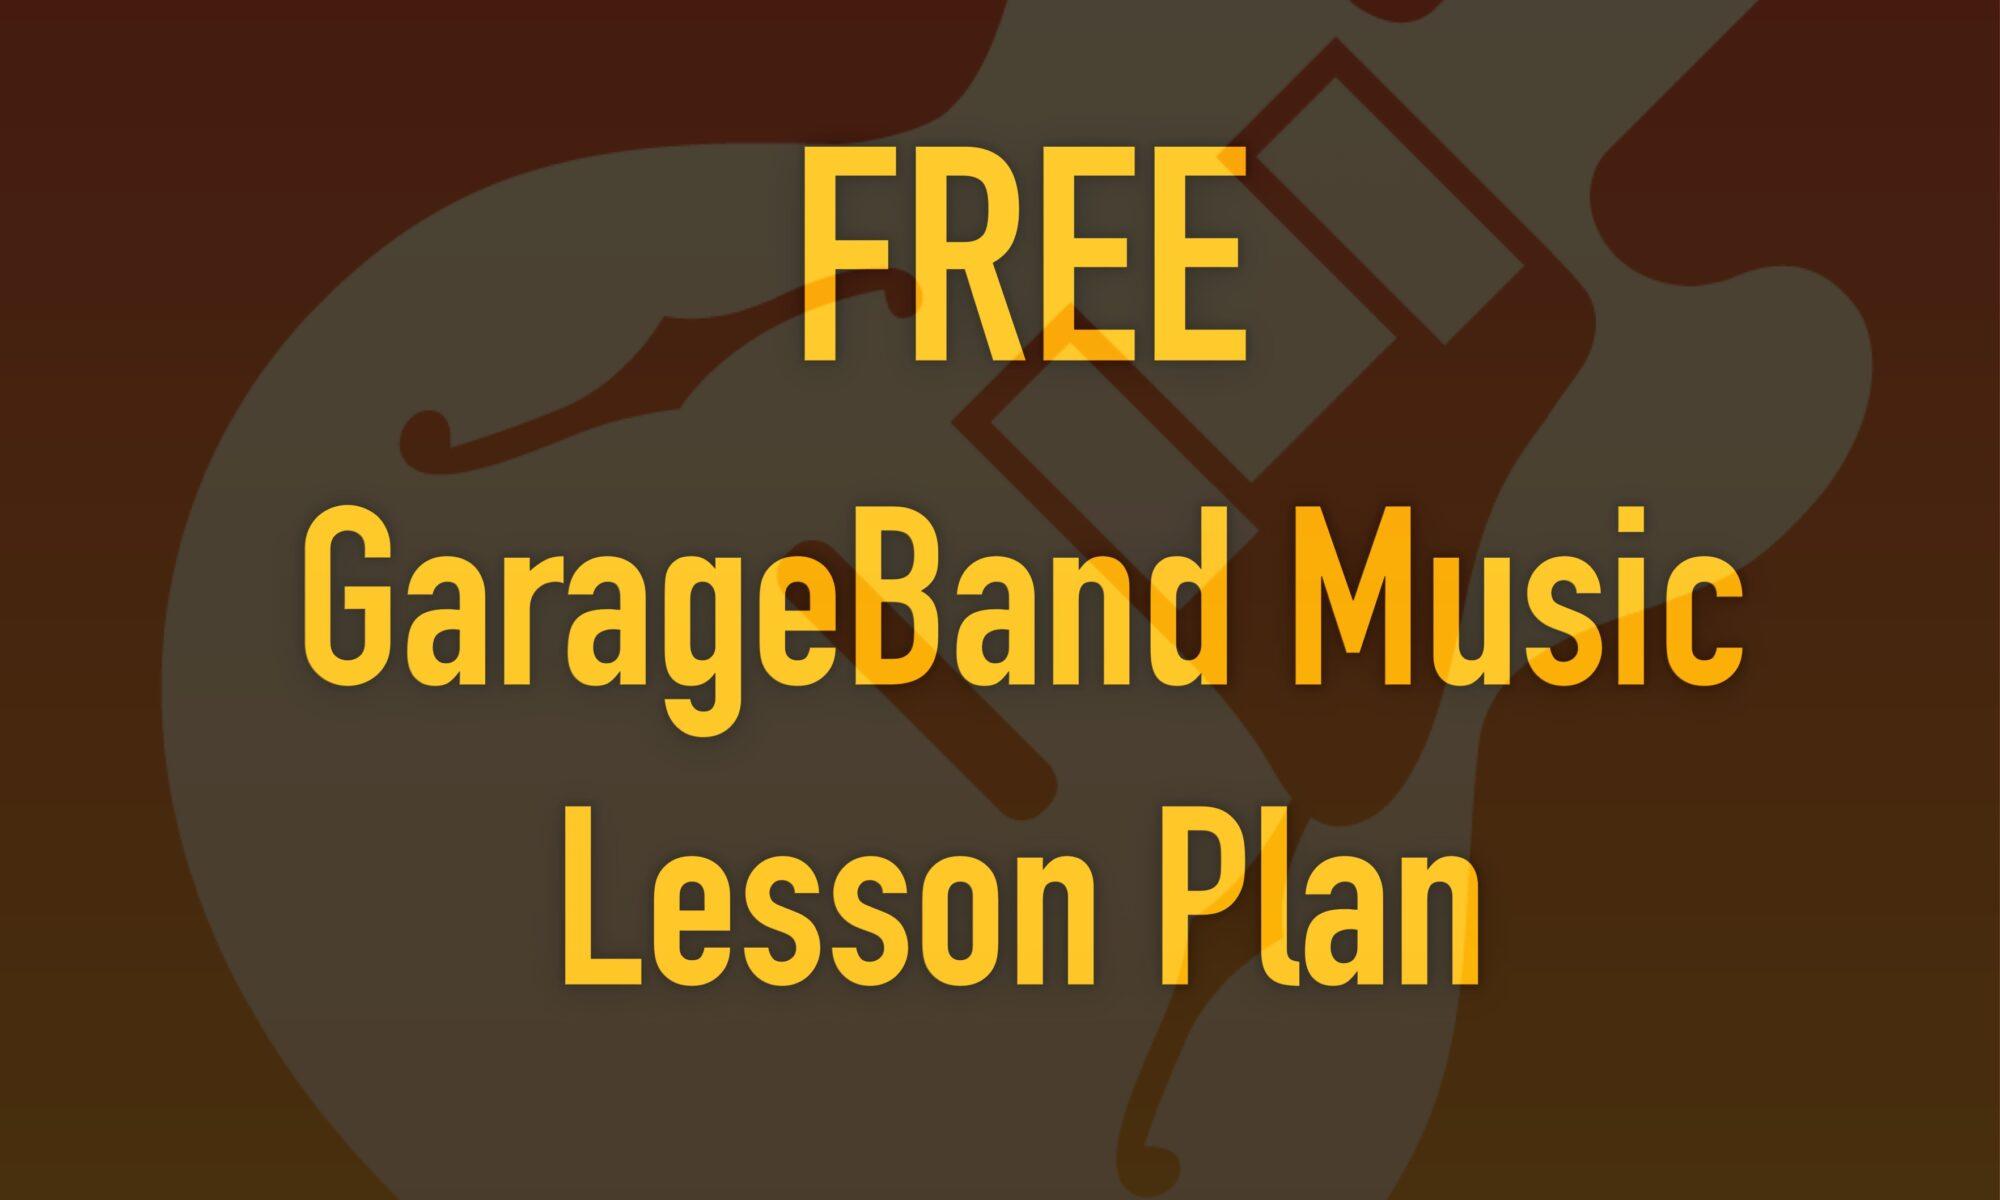 GarageBand on the iPad. Simple Lesson